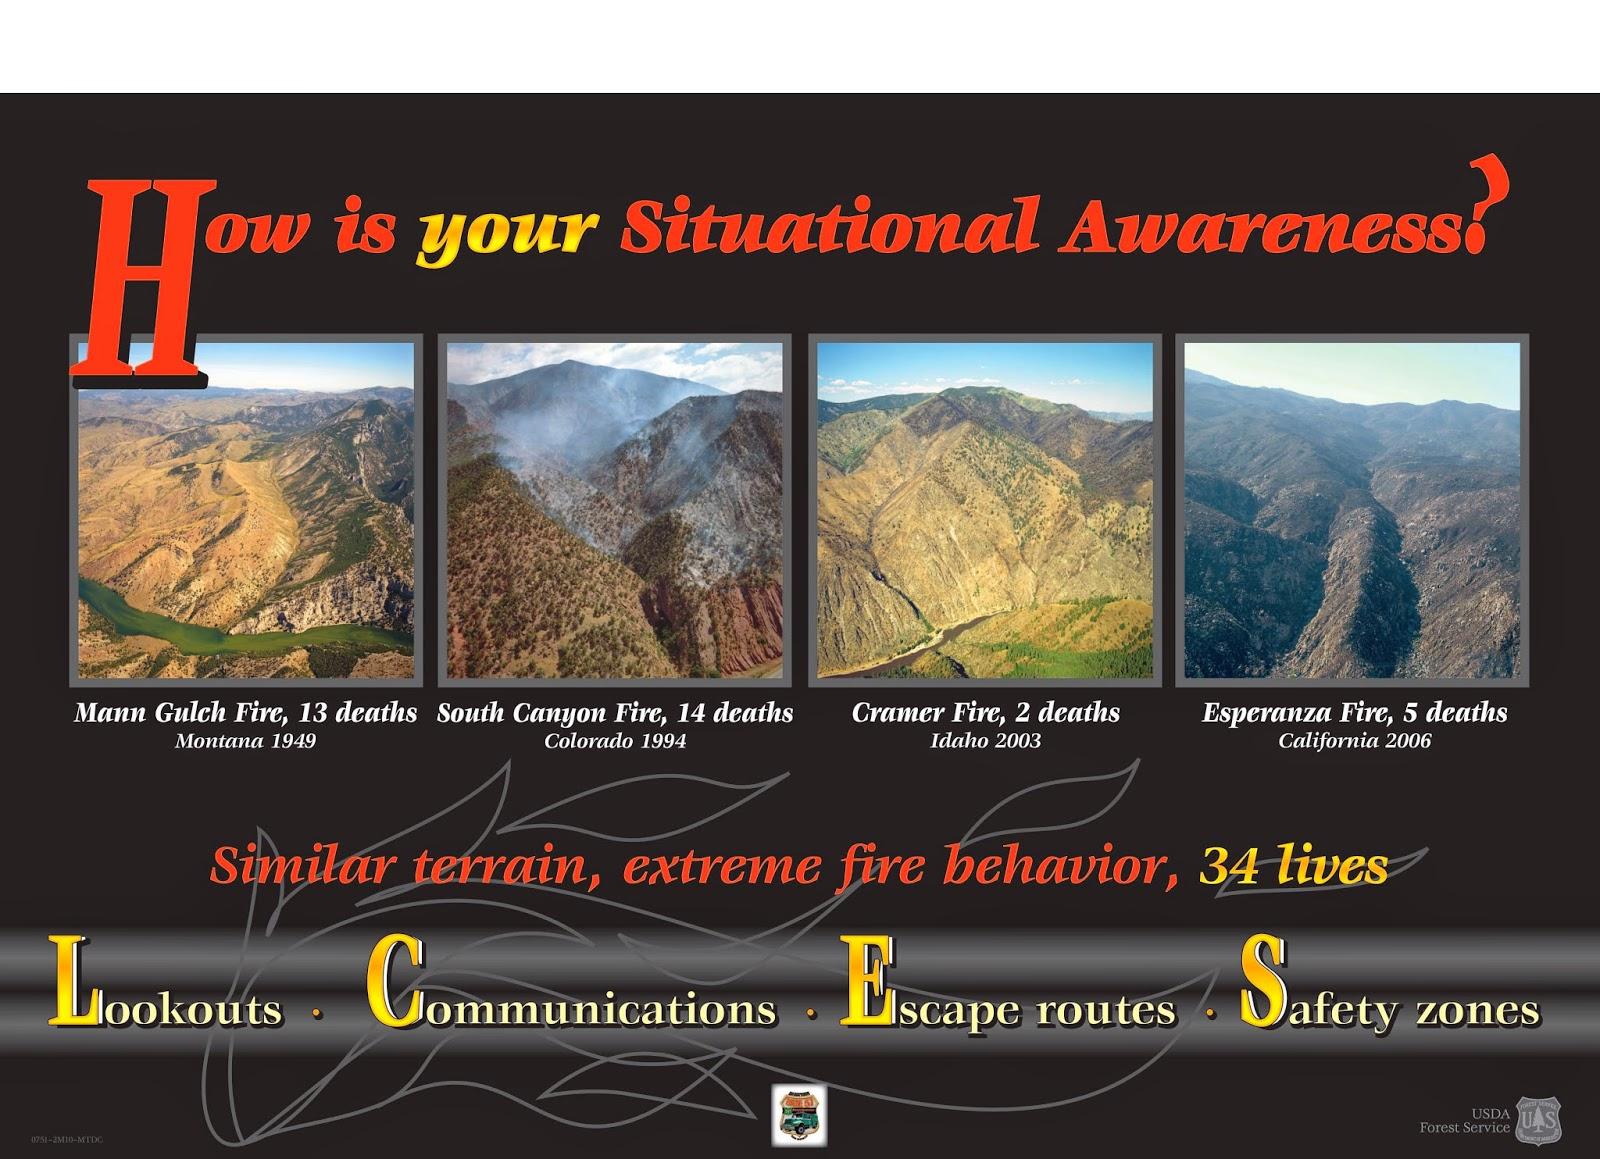 LCES - Know your SA!